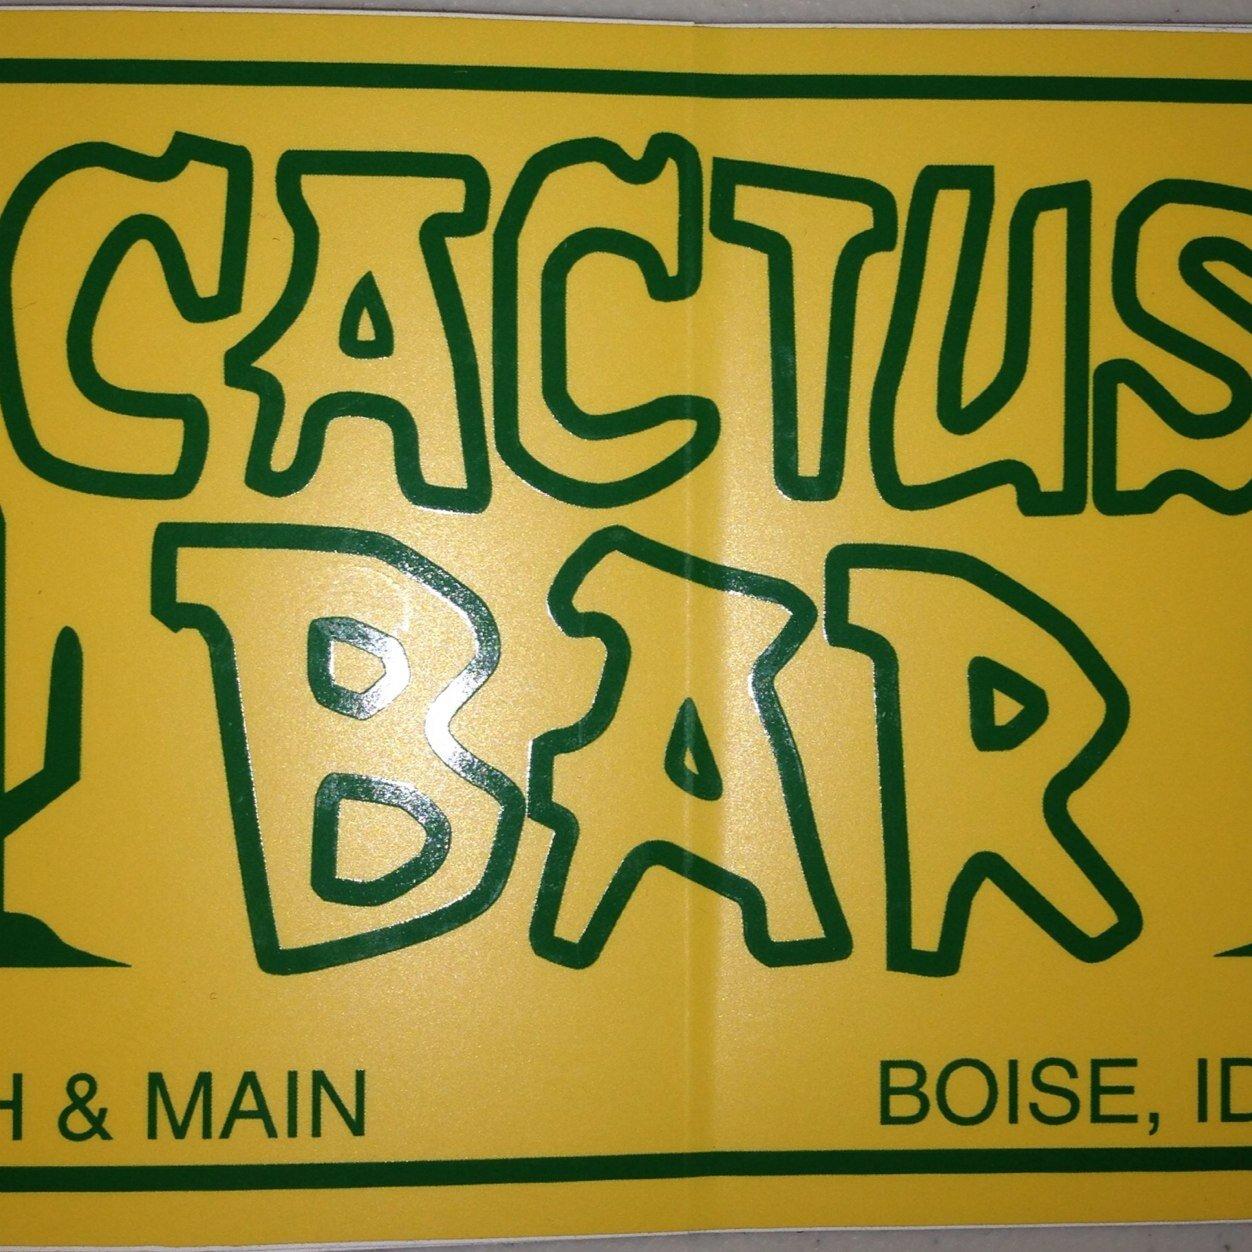 cactus bar cactusbarboise twitter. Black Bedroom Furniture Sets. Home Design Ideas